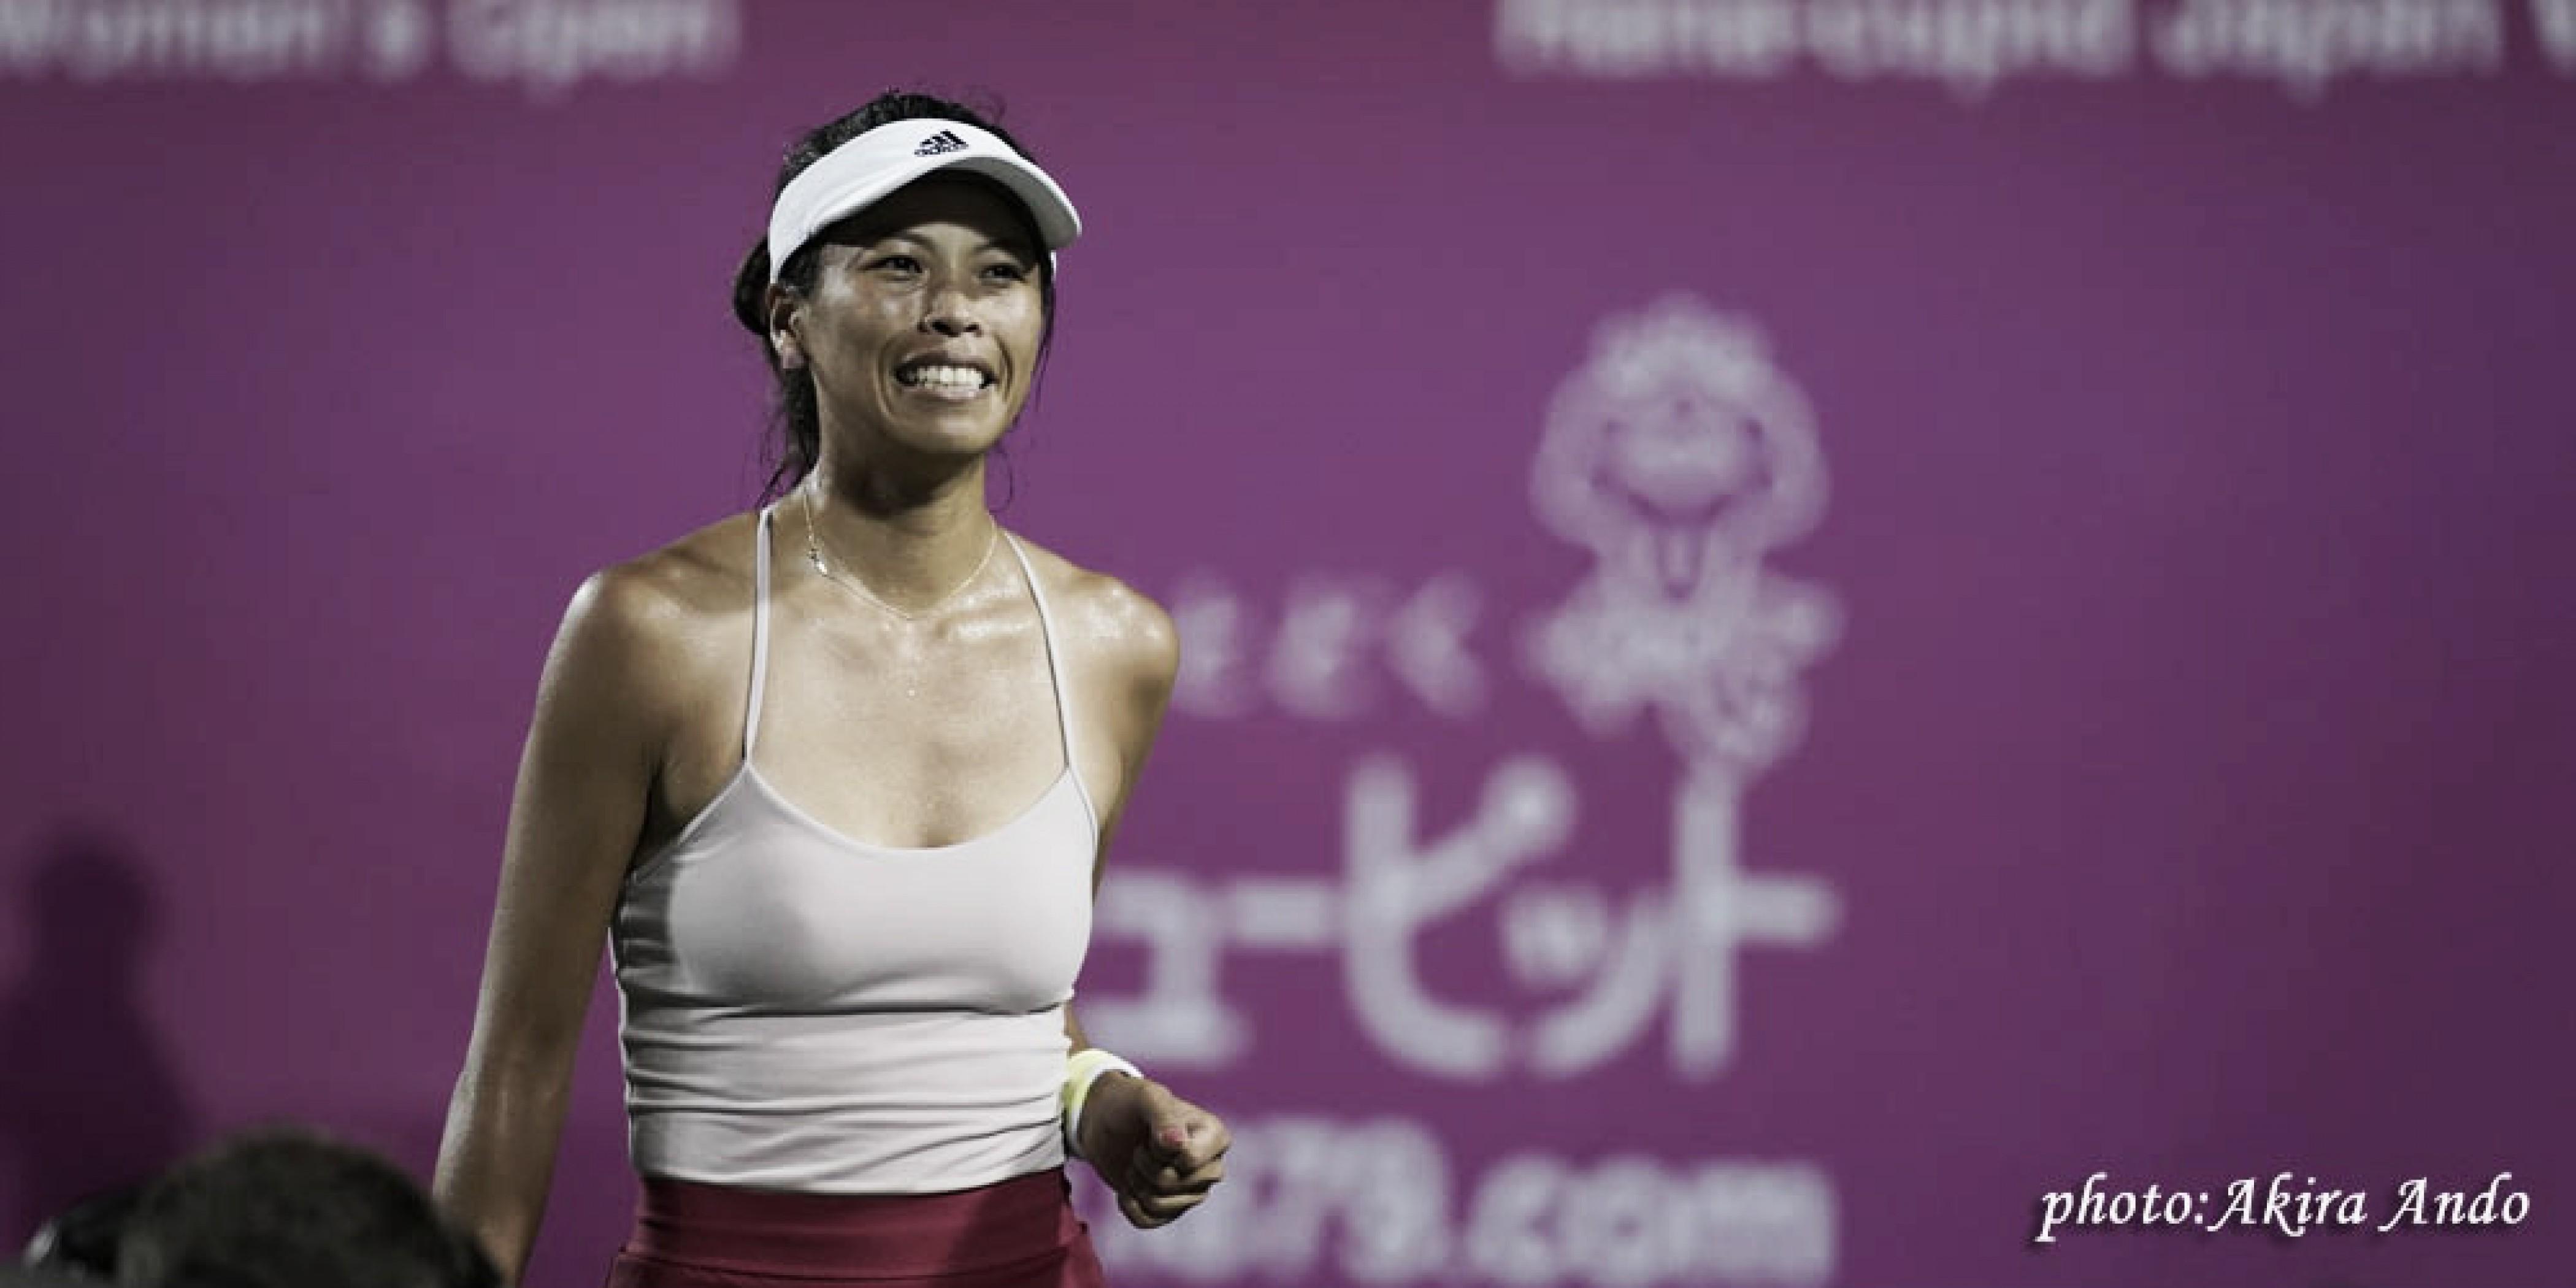 Hsieh completa jornada dupla, vence Wang e vai à final em Hiroshima